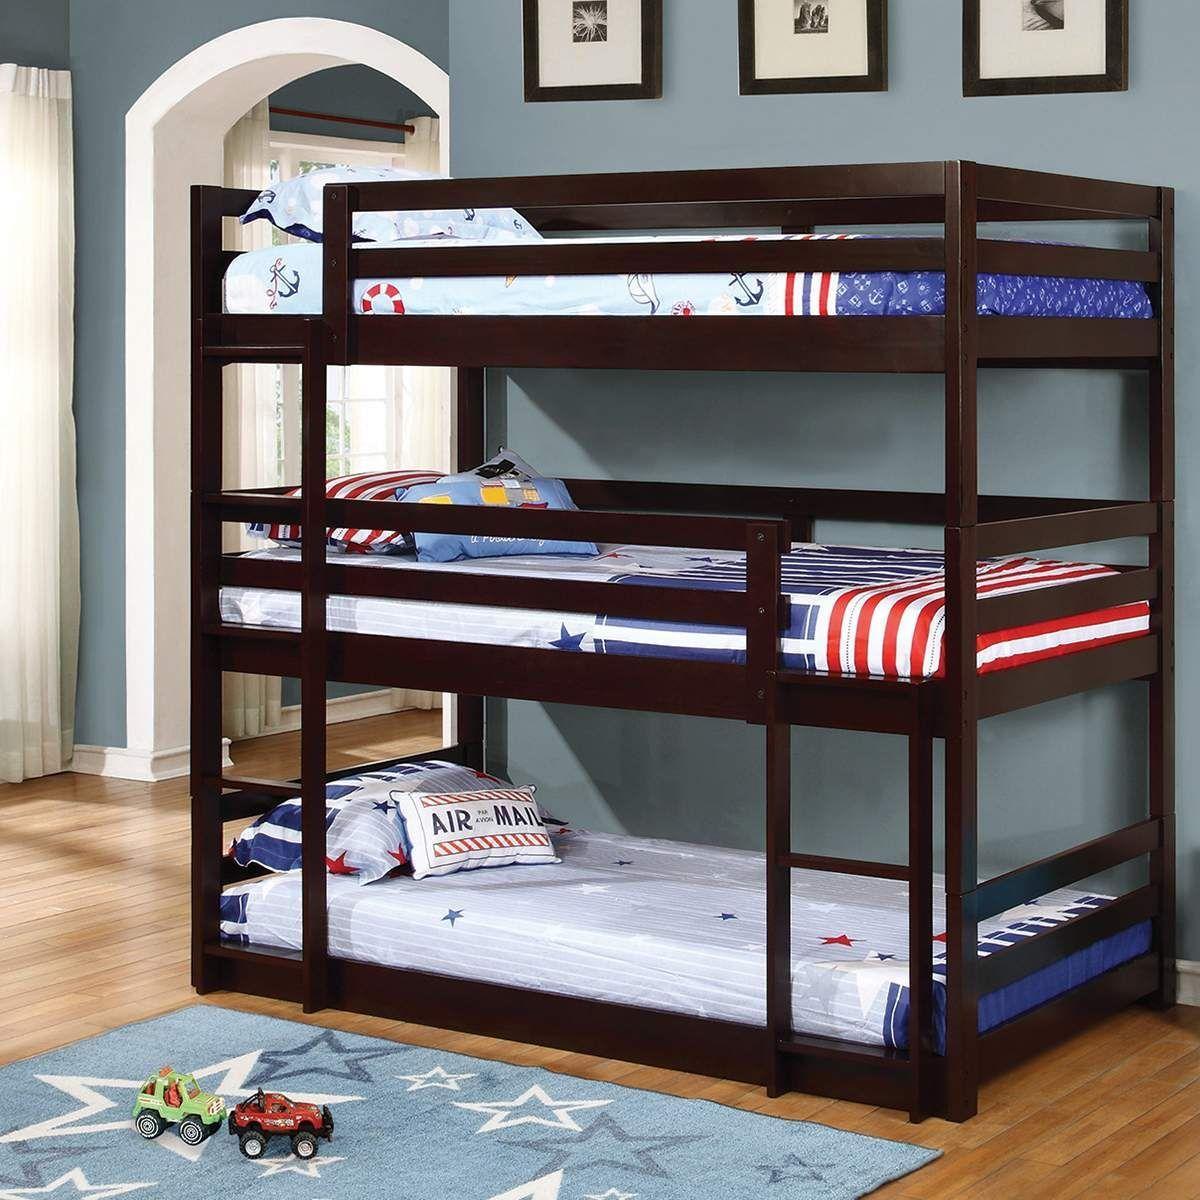 Double loft bed with desk  The Triple Decker triple twin bunk bed speaks for itself Just look